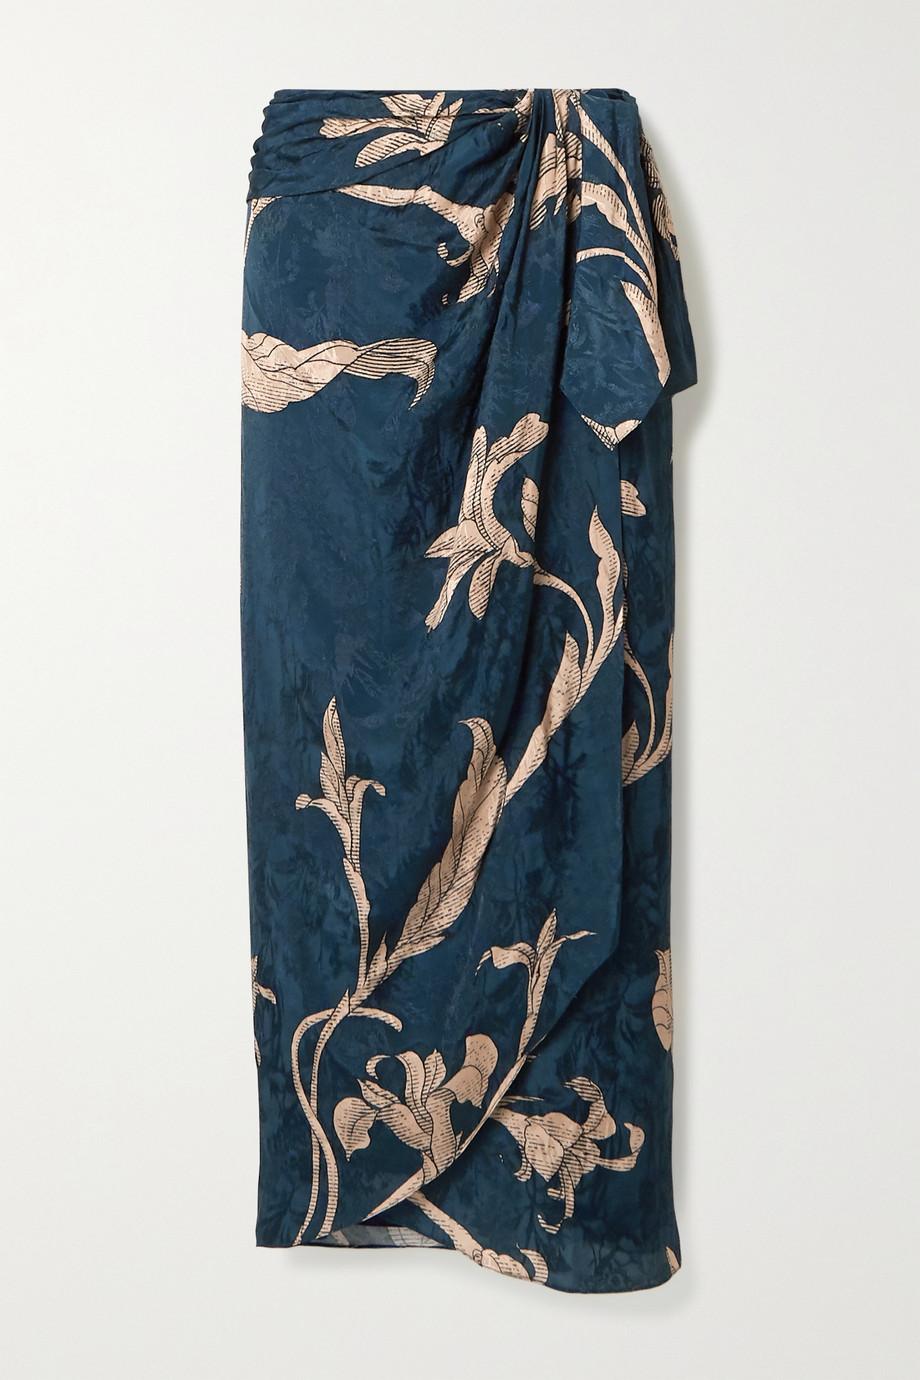 Johanna Ortiz + NET SUSTAIN Tide of Love Wickelrock aus glänzendem Jacquard mit Blumenprint